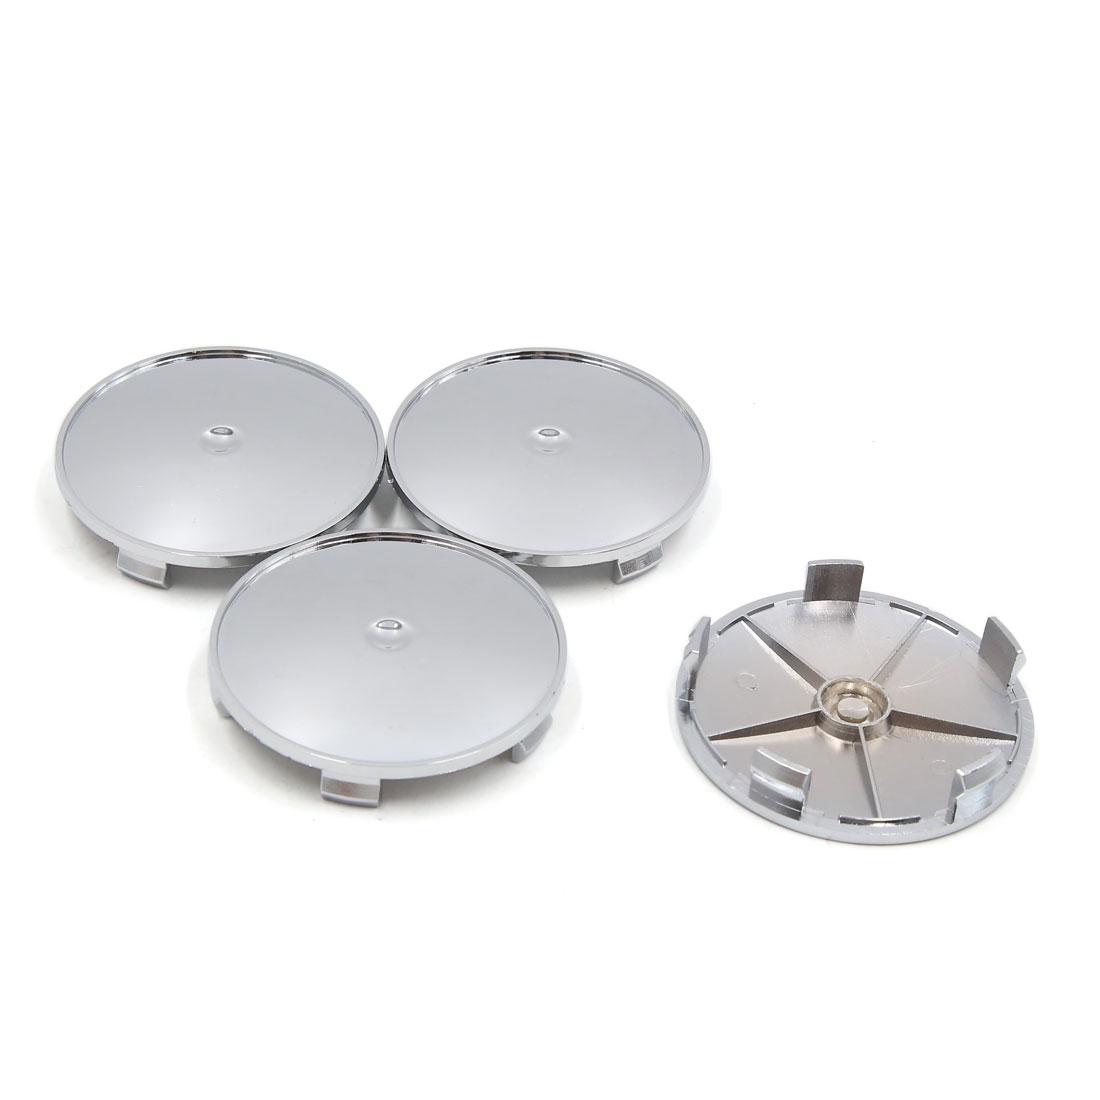 4 Pcs Silver Tone Chrome 68mm Dia 5 Lugs Wheel Center Cap Hub Cover for Car